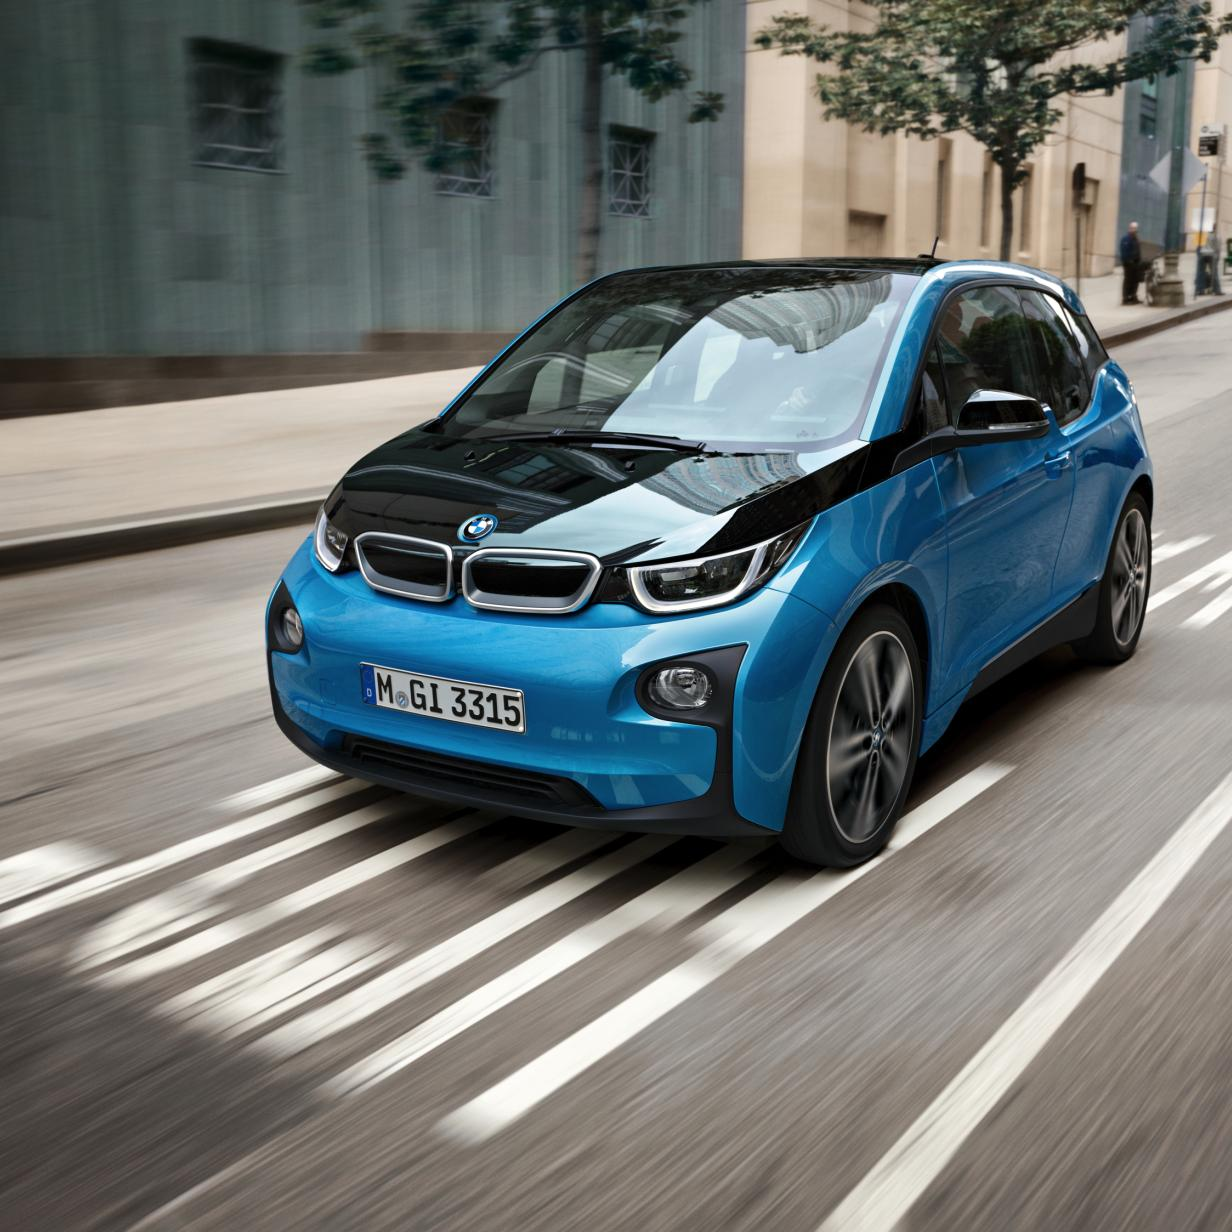 BMW stellt Elektroauto i3 ein